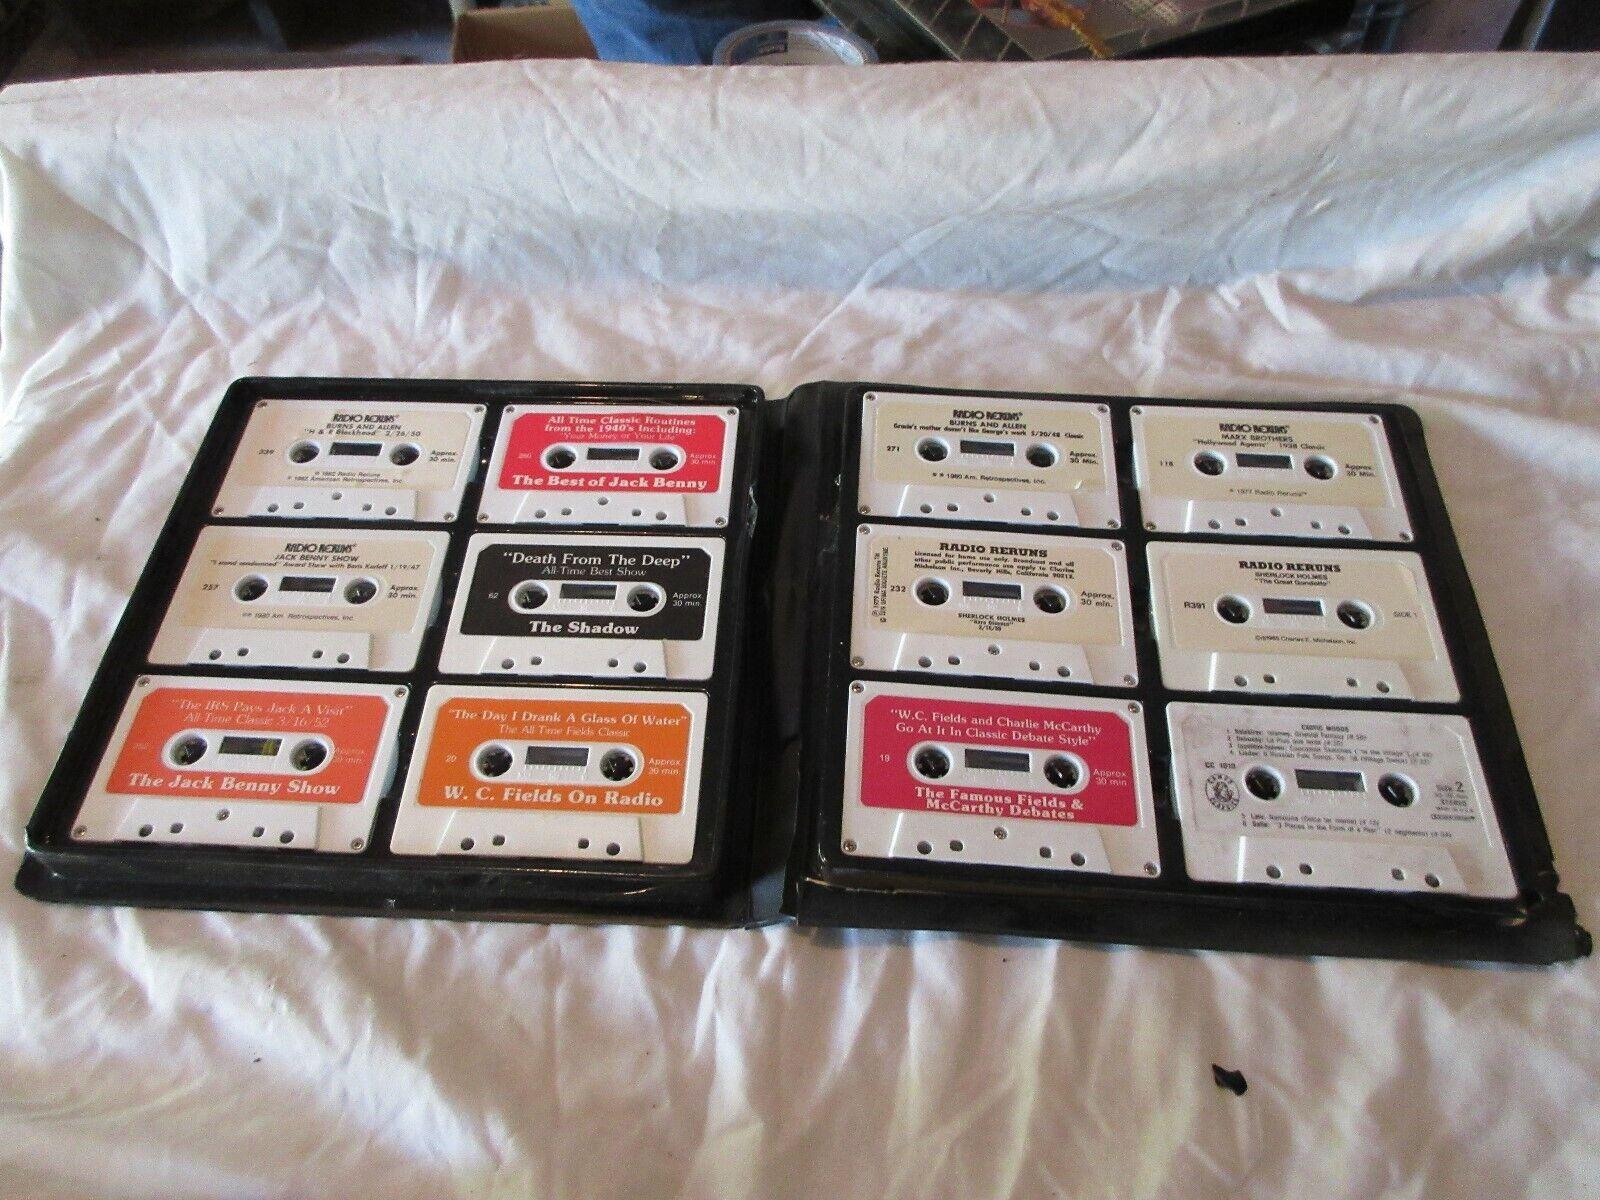 Radio Reruns on Cassette, Vintage Entertainment Memorab